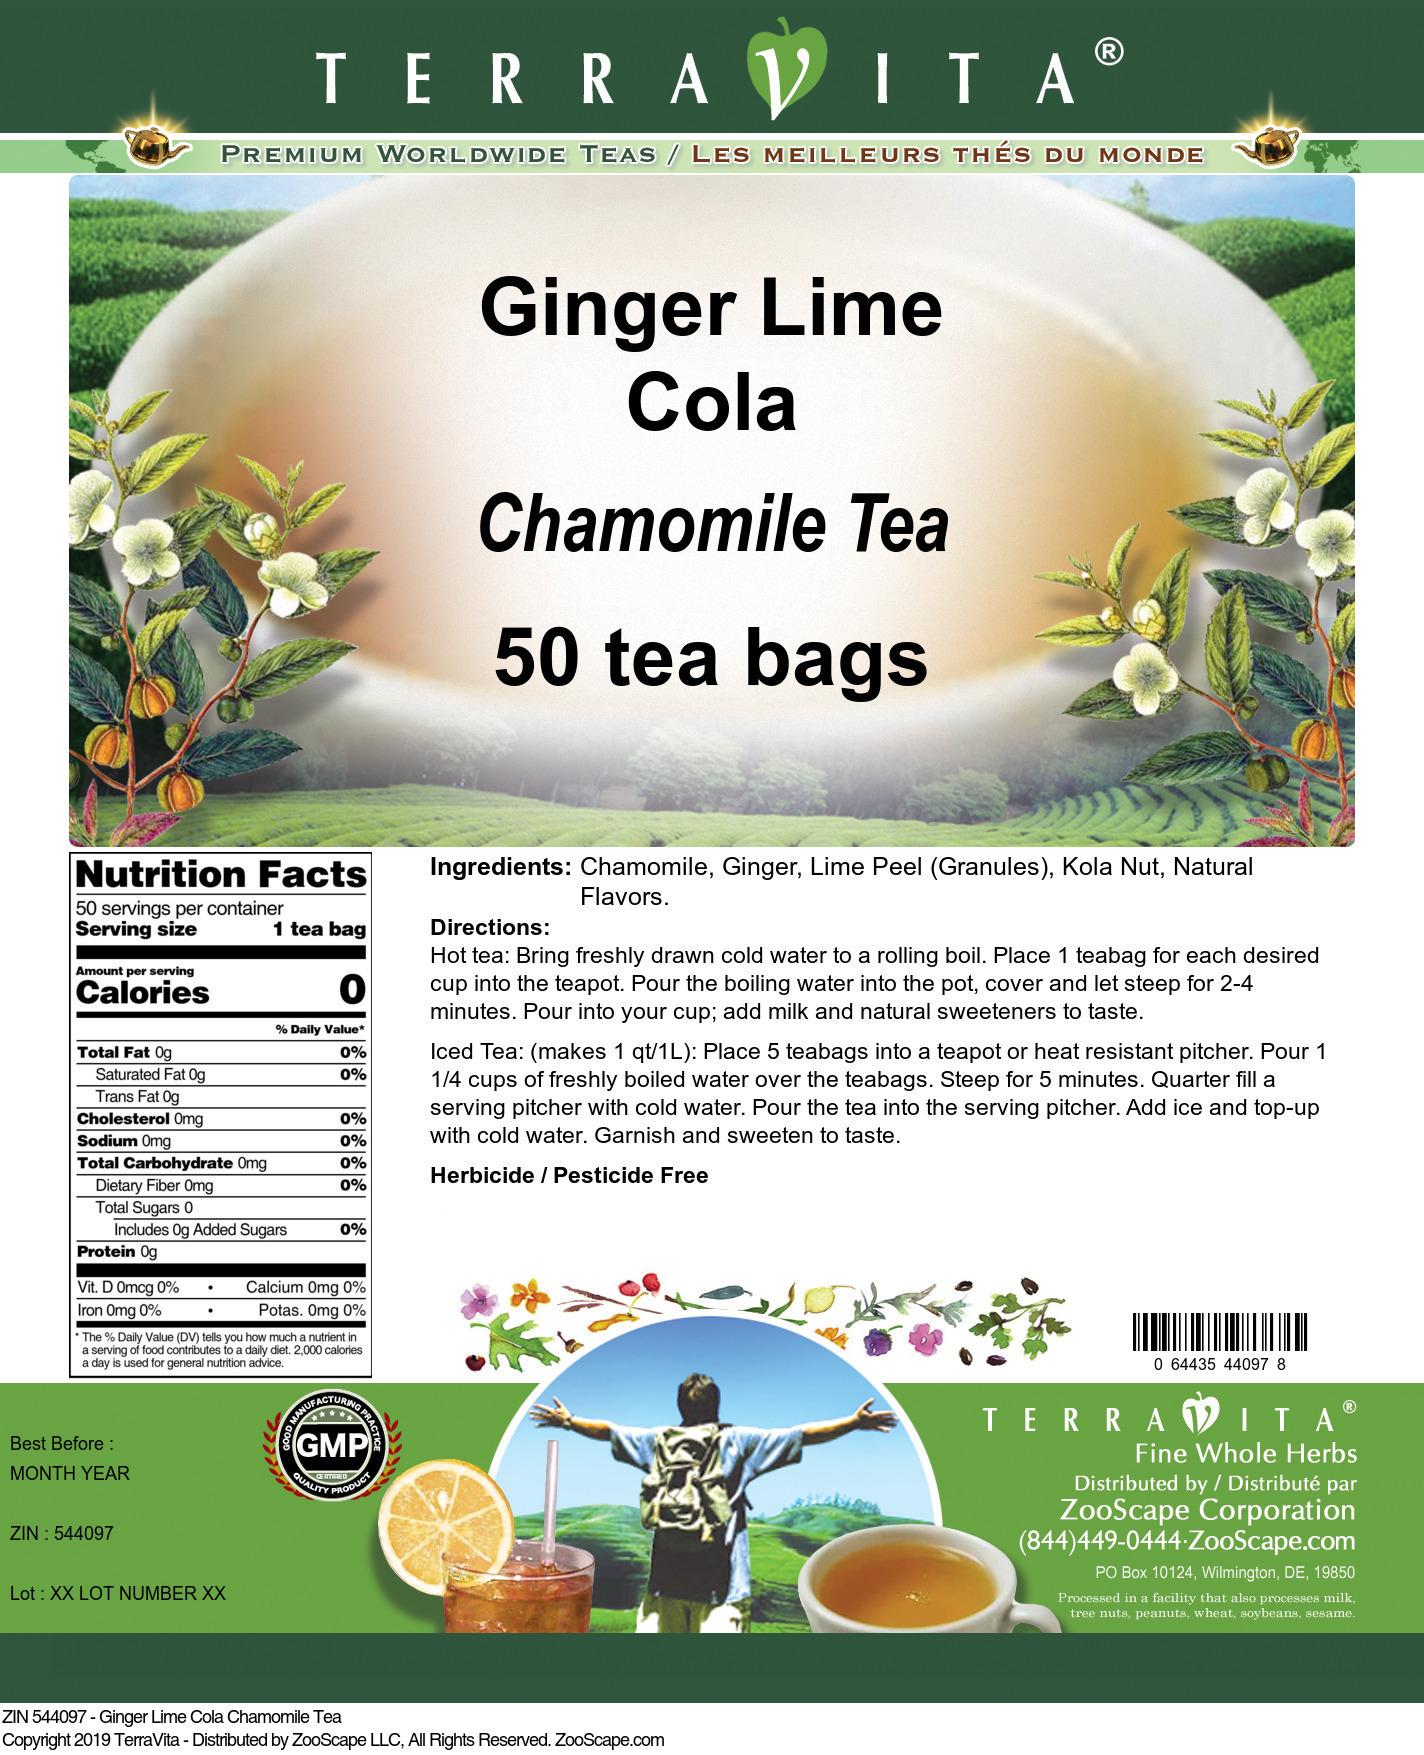 Ginger Lime Cola Chamomile Tea